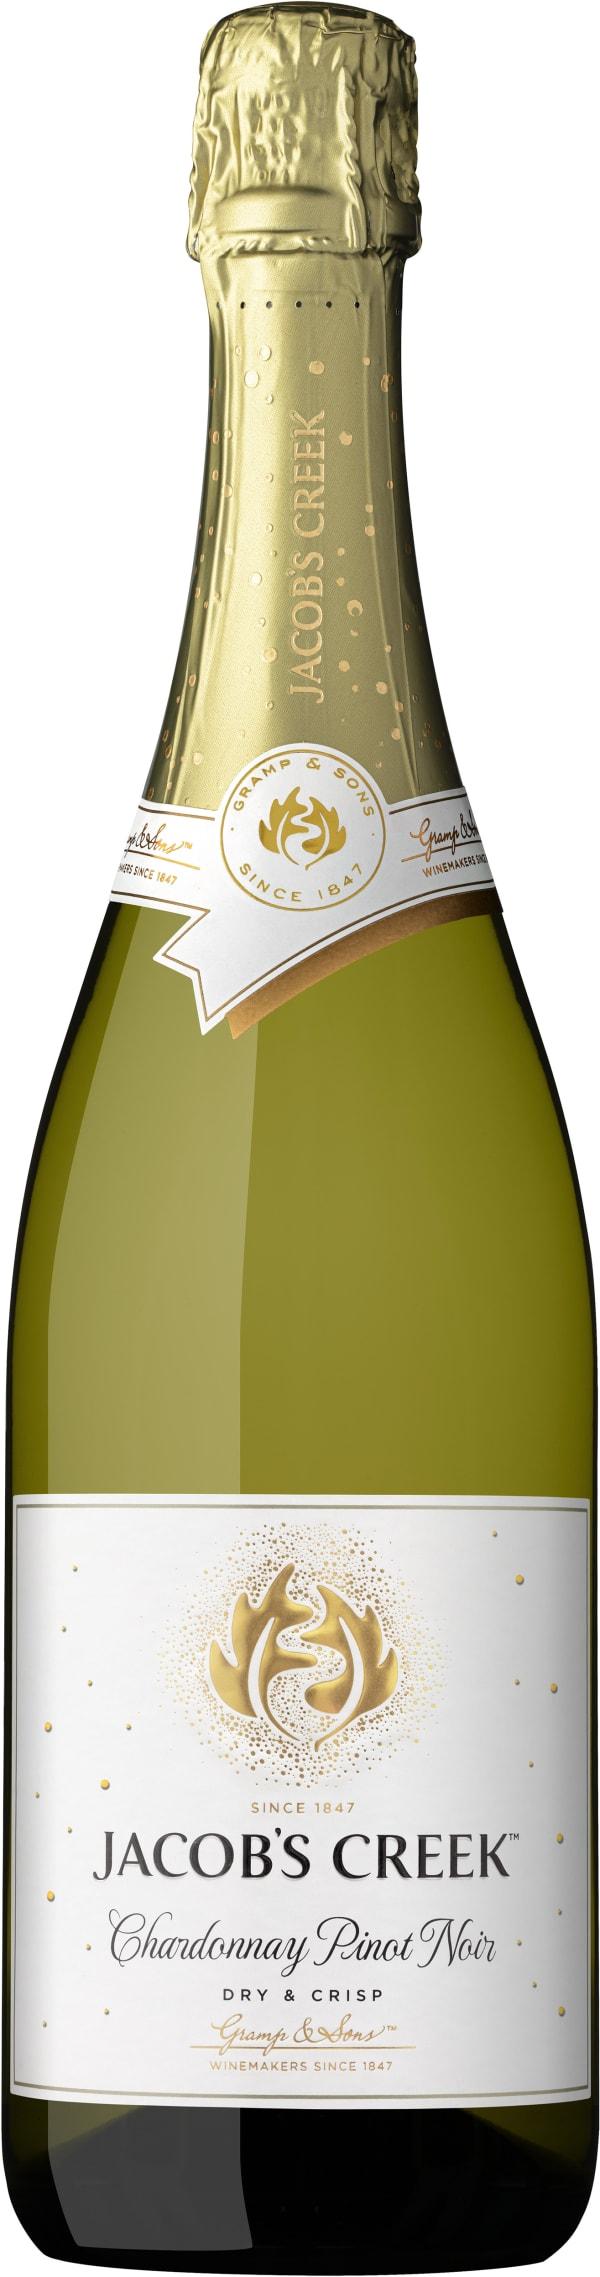 Jacob's Creek Chardonnay Pinot Noir Brut